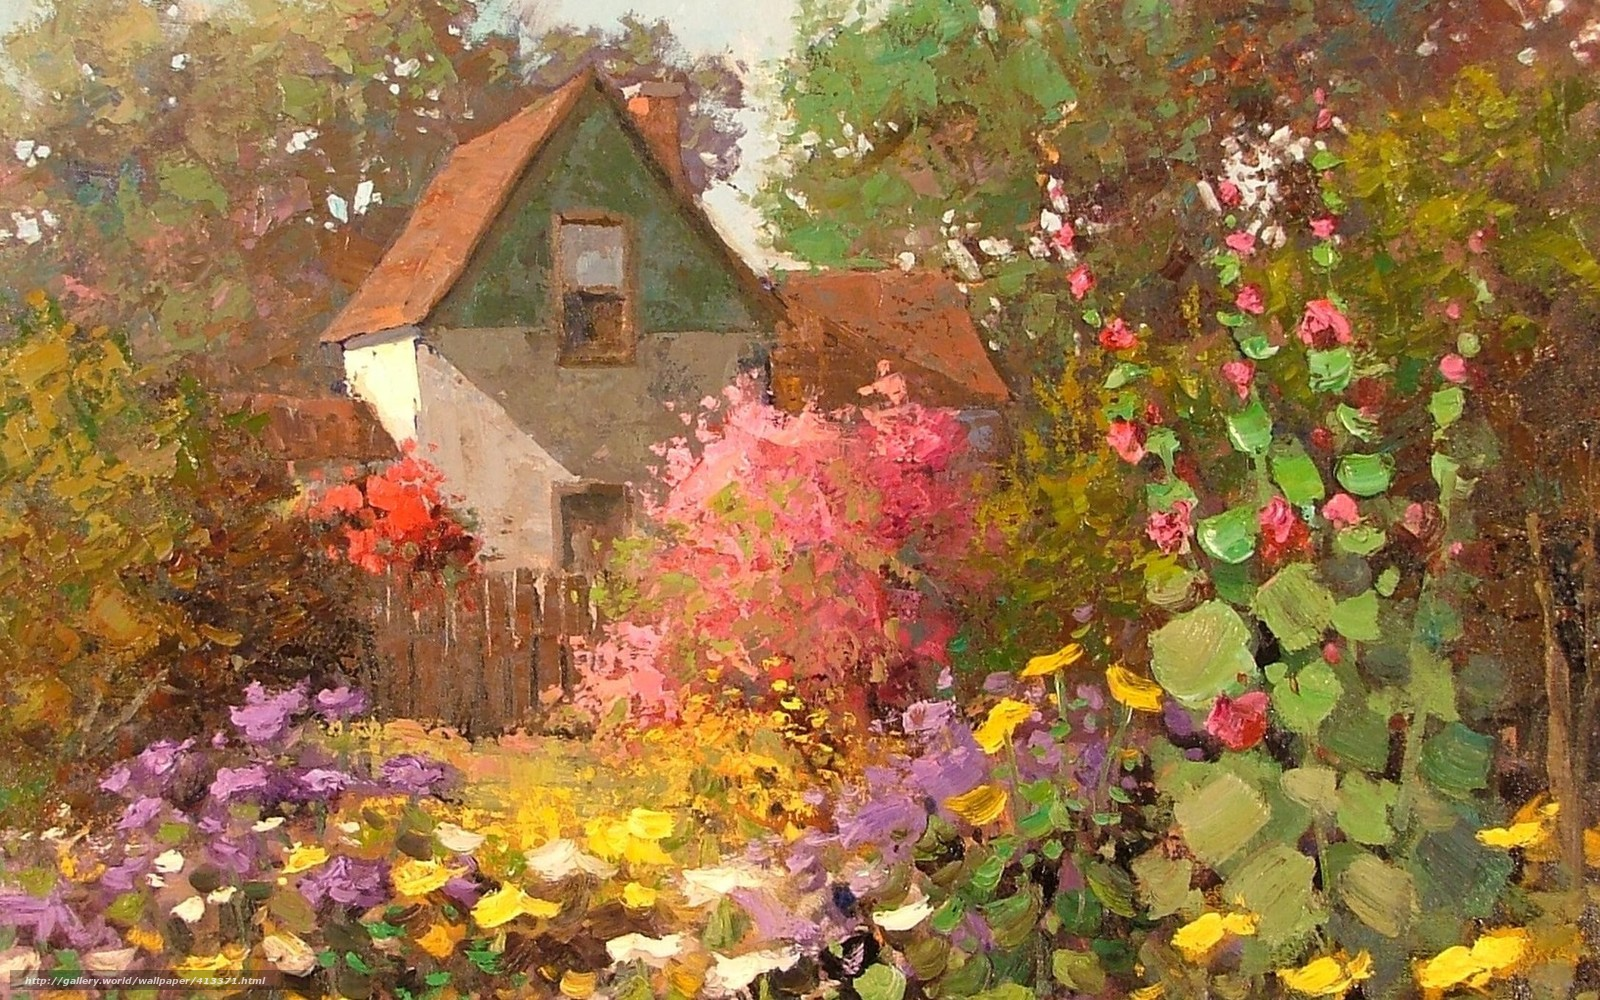 Tlcharger fond d 39 ecran art maison fleurs jardin fonds d for Jardin japonais fond d ecran